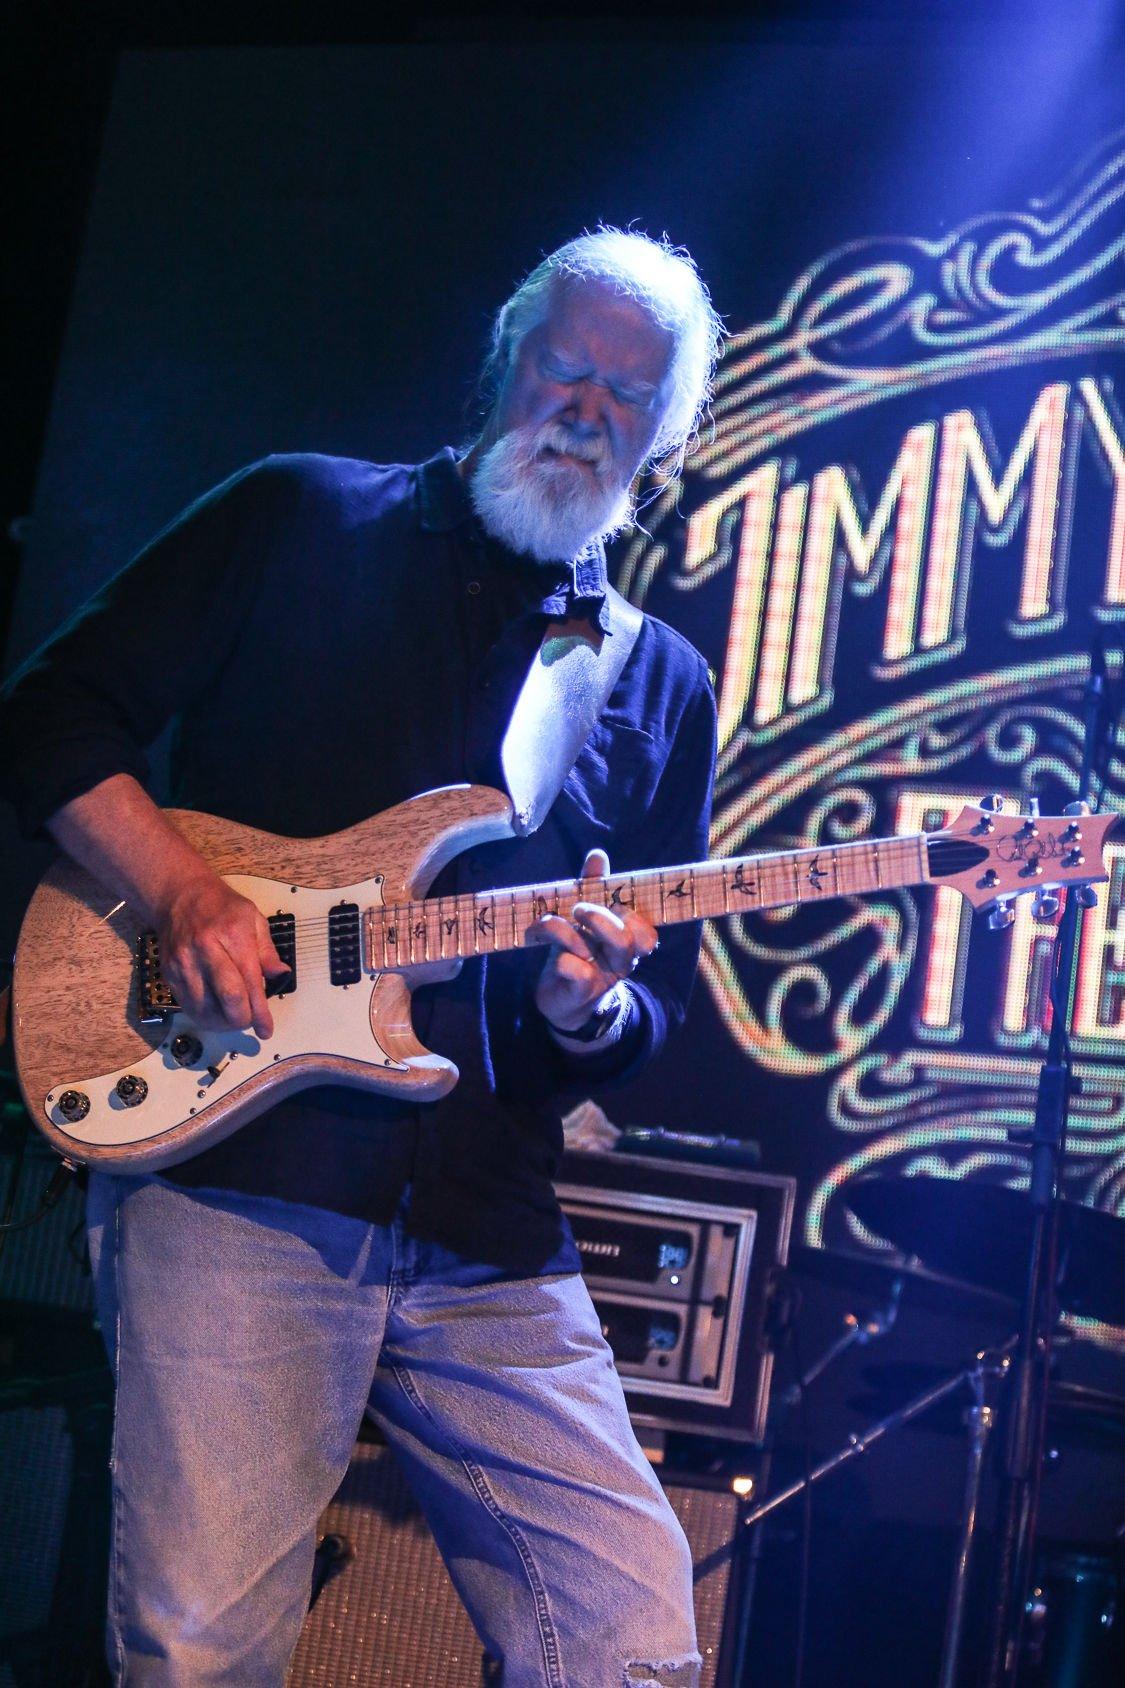 Jimmy Herring2019-09-23 at 12.49.16 PM 2.jpeg